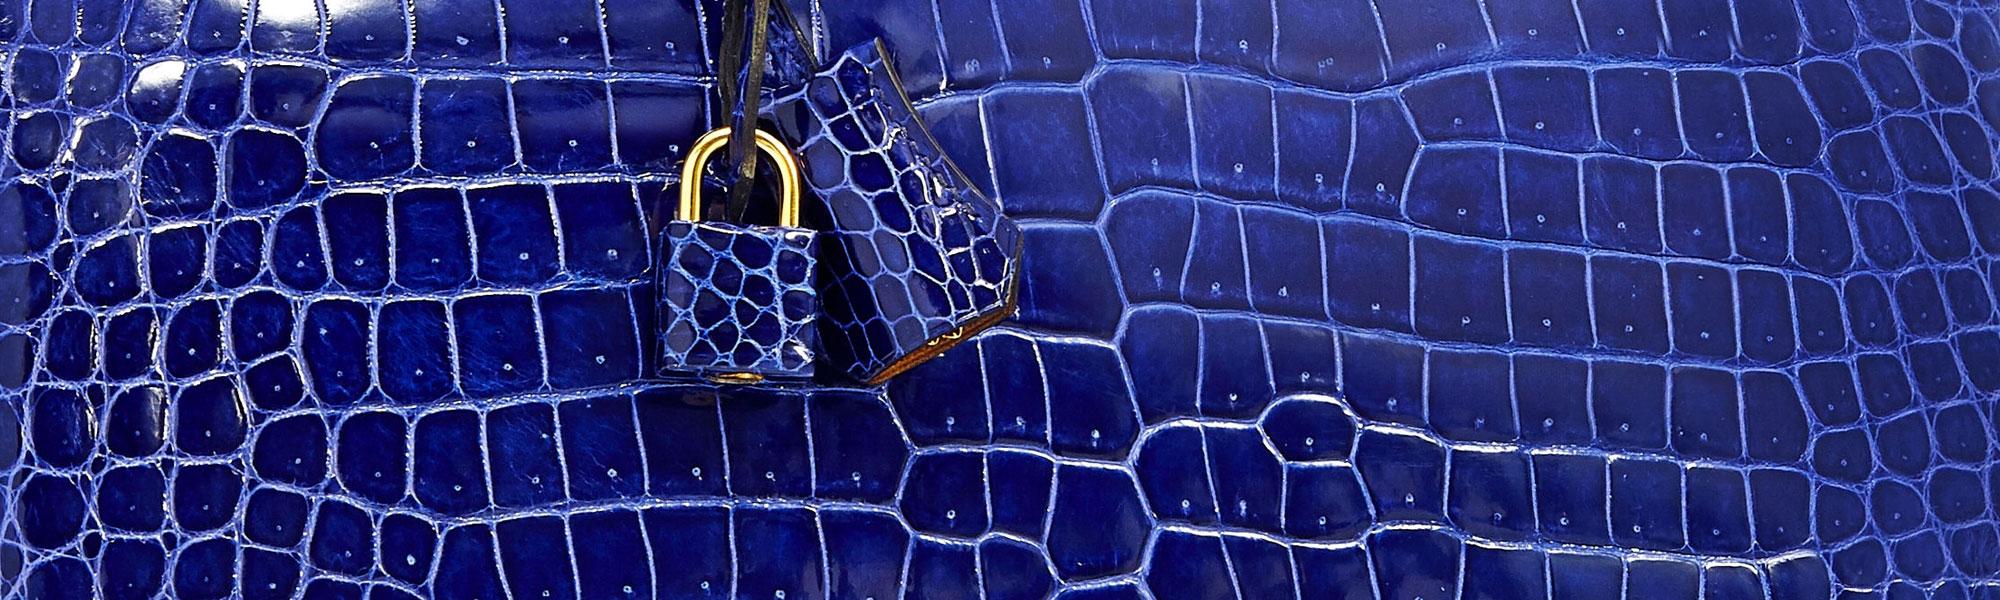 8c5c9cb0f6b1 Hermes  Handbags with a Distinguished History